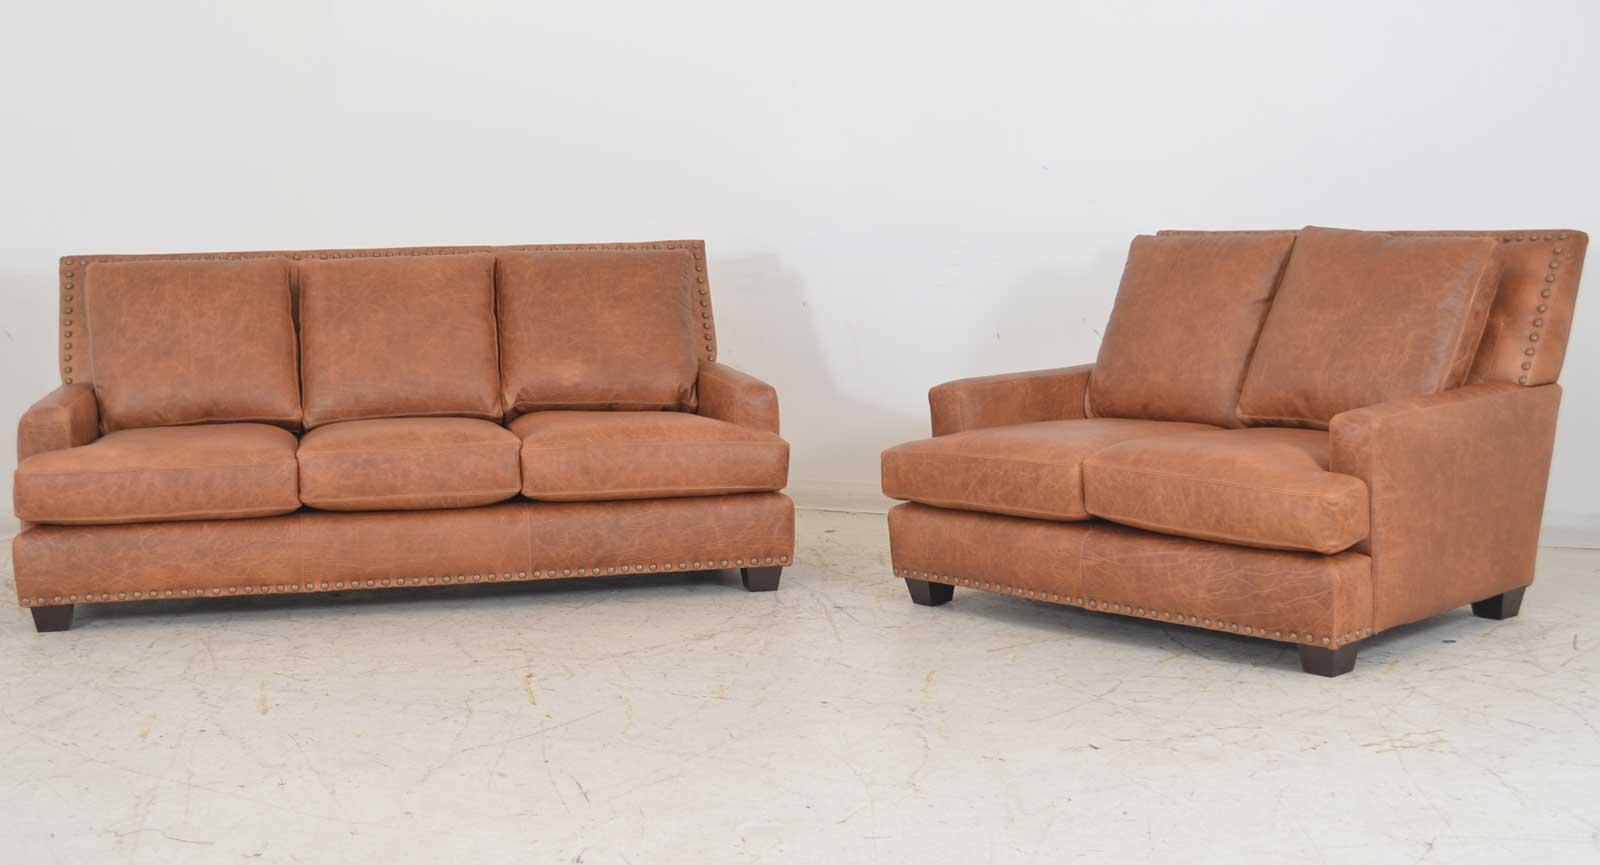 Wondrous Kara The Leather Sofa Company Machost Co Dining Chair Design Ideas Machostcouk